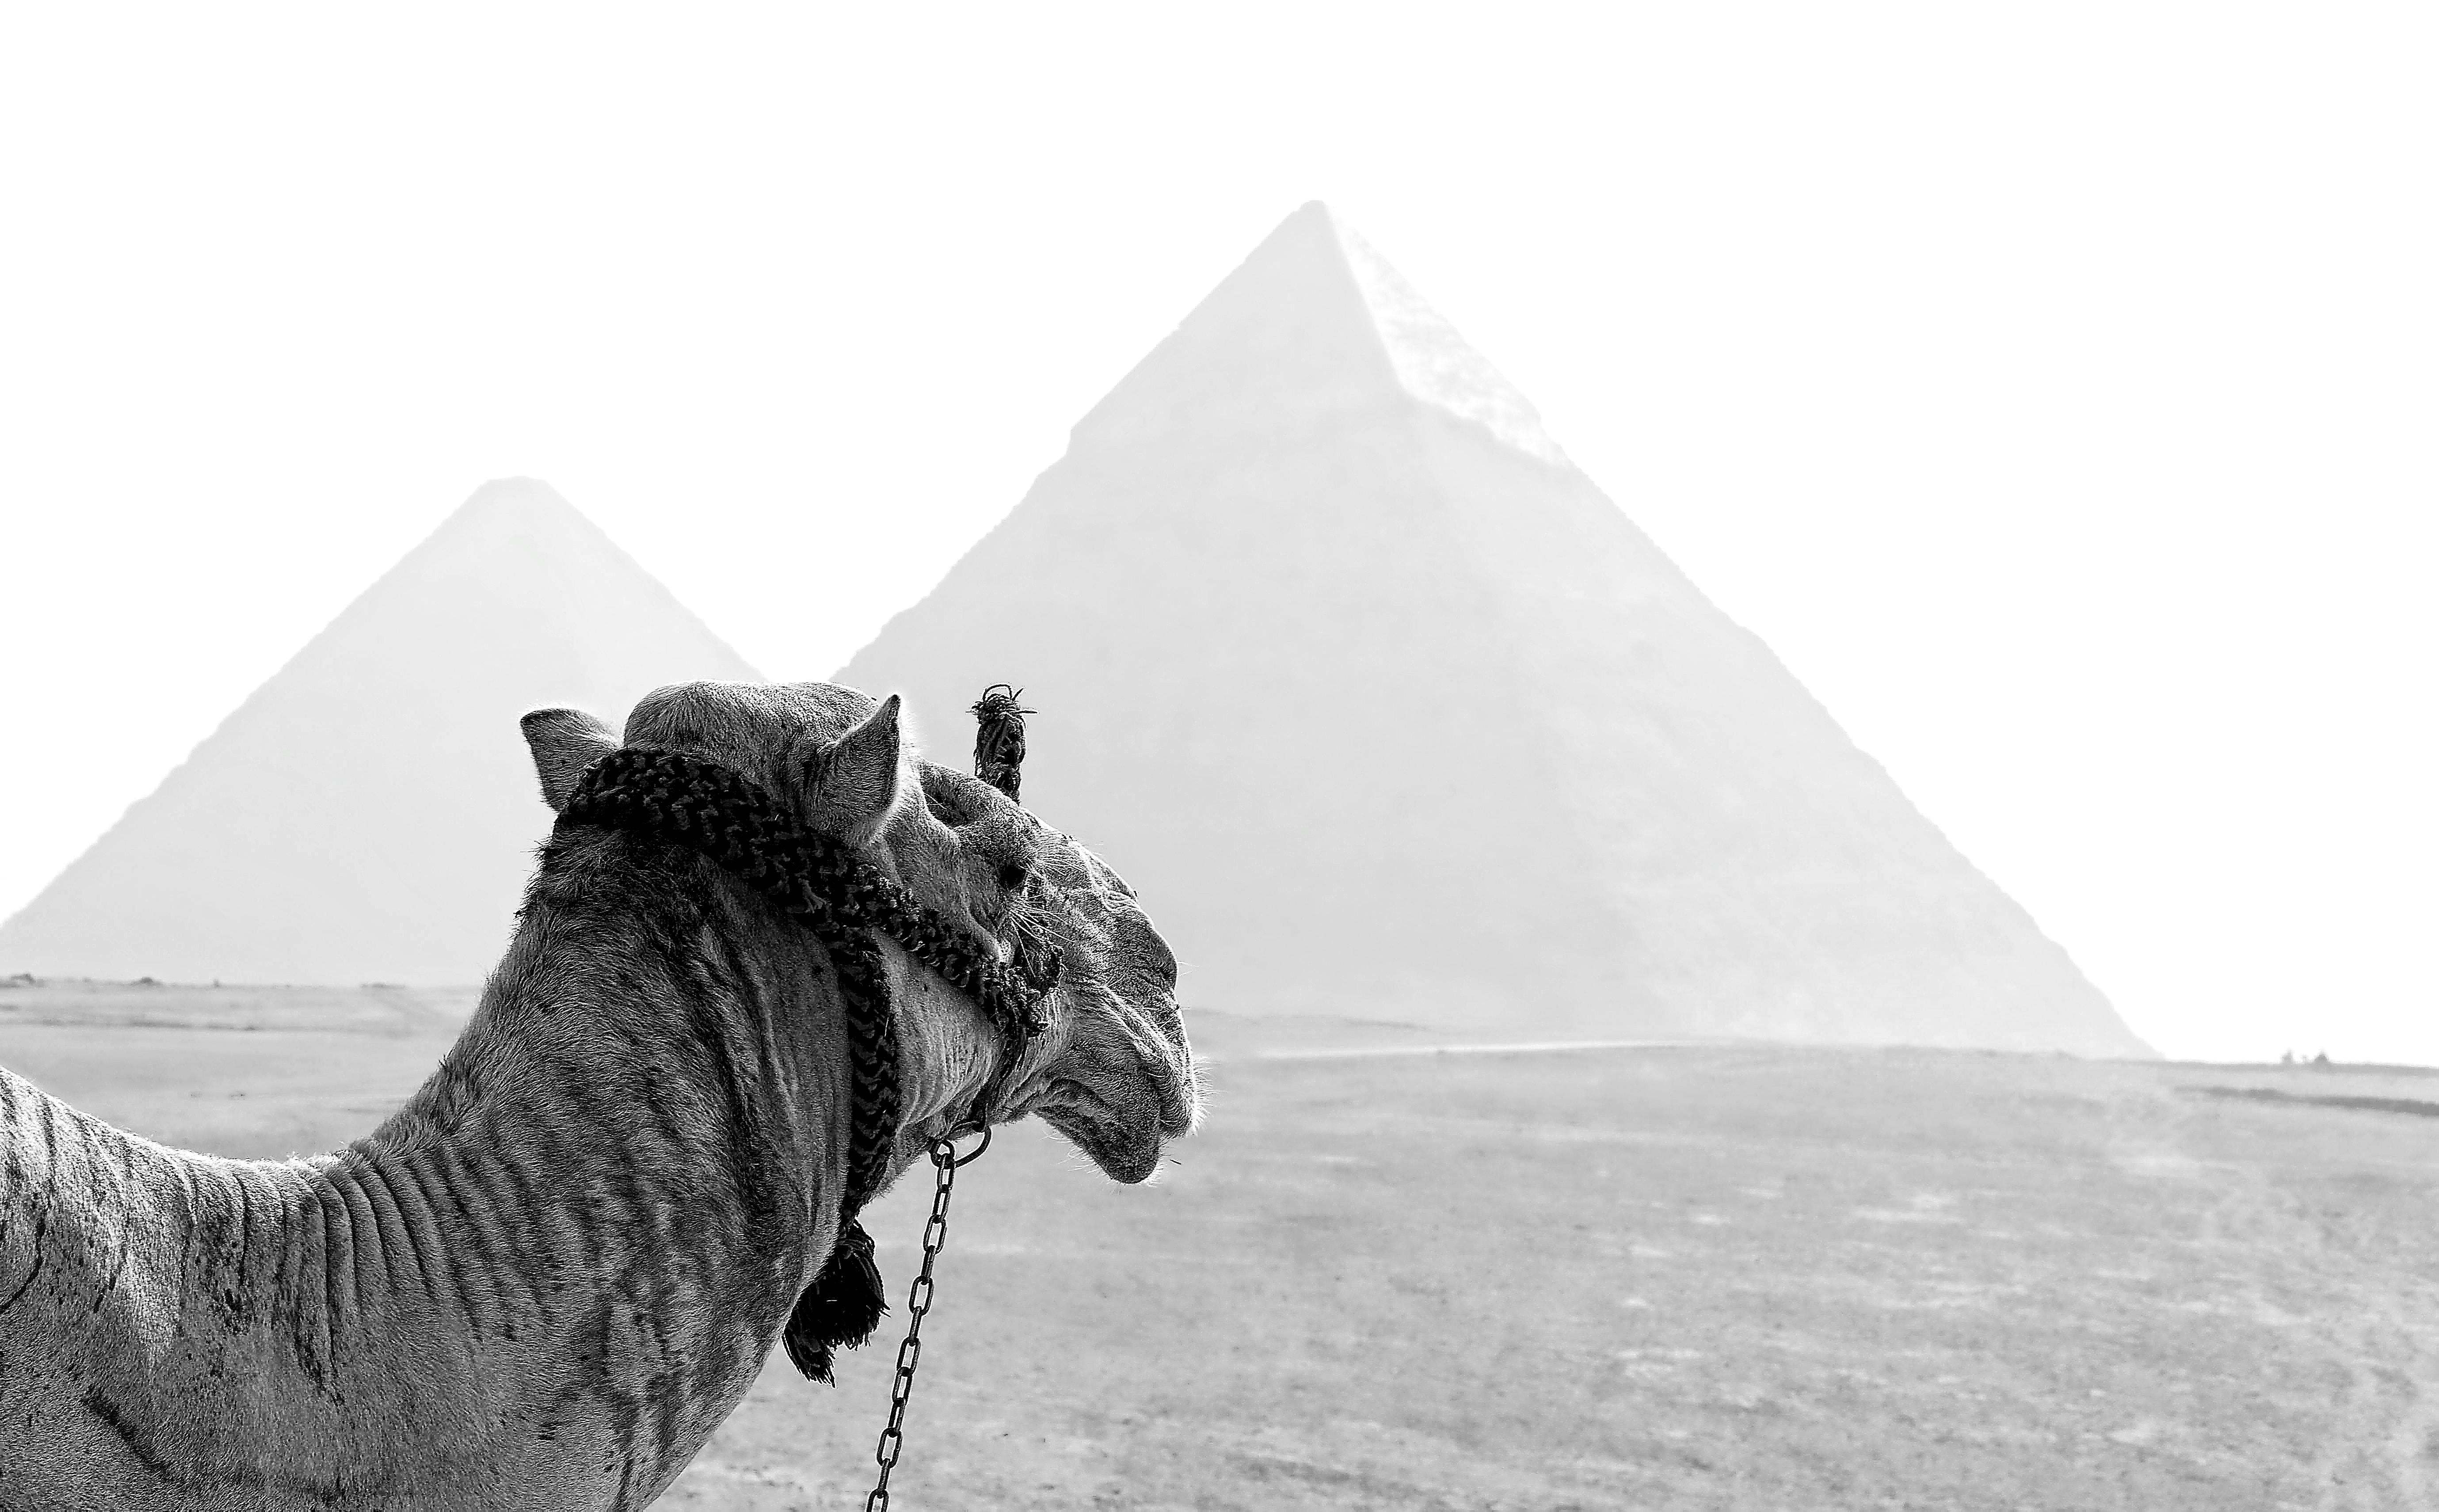 le caire, pyramide, egypte